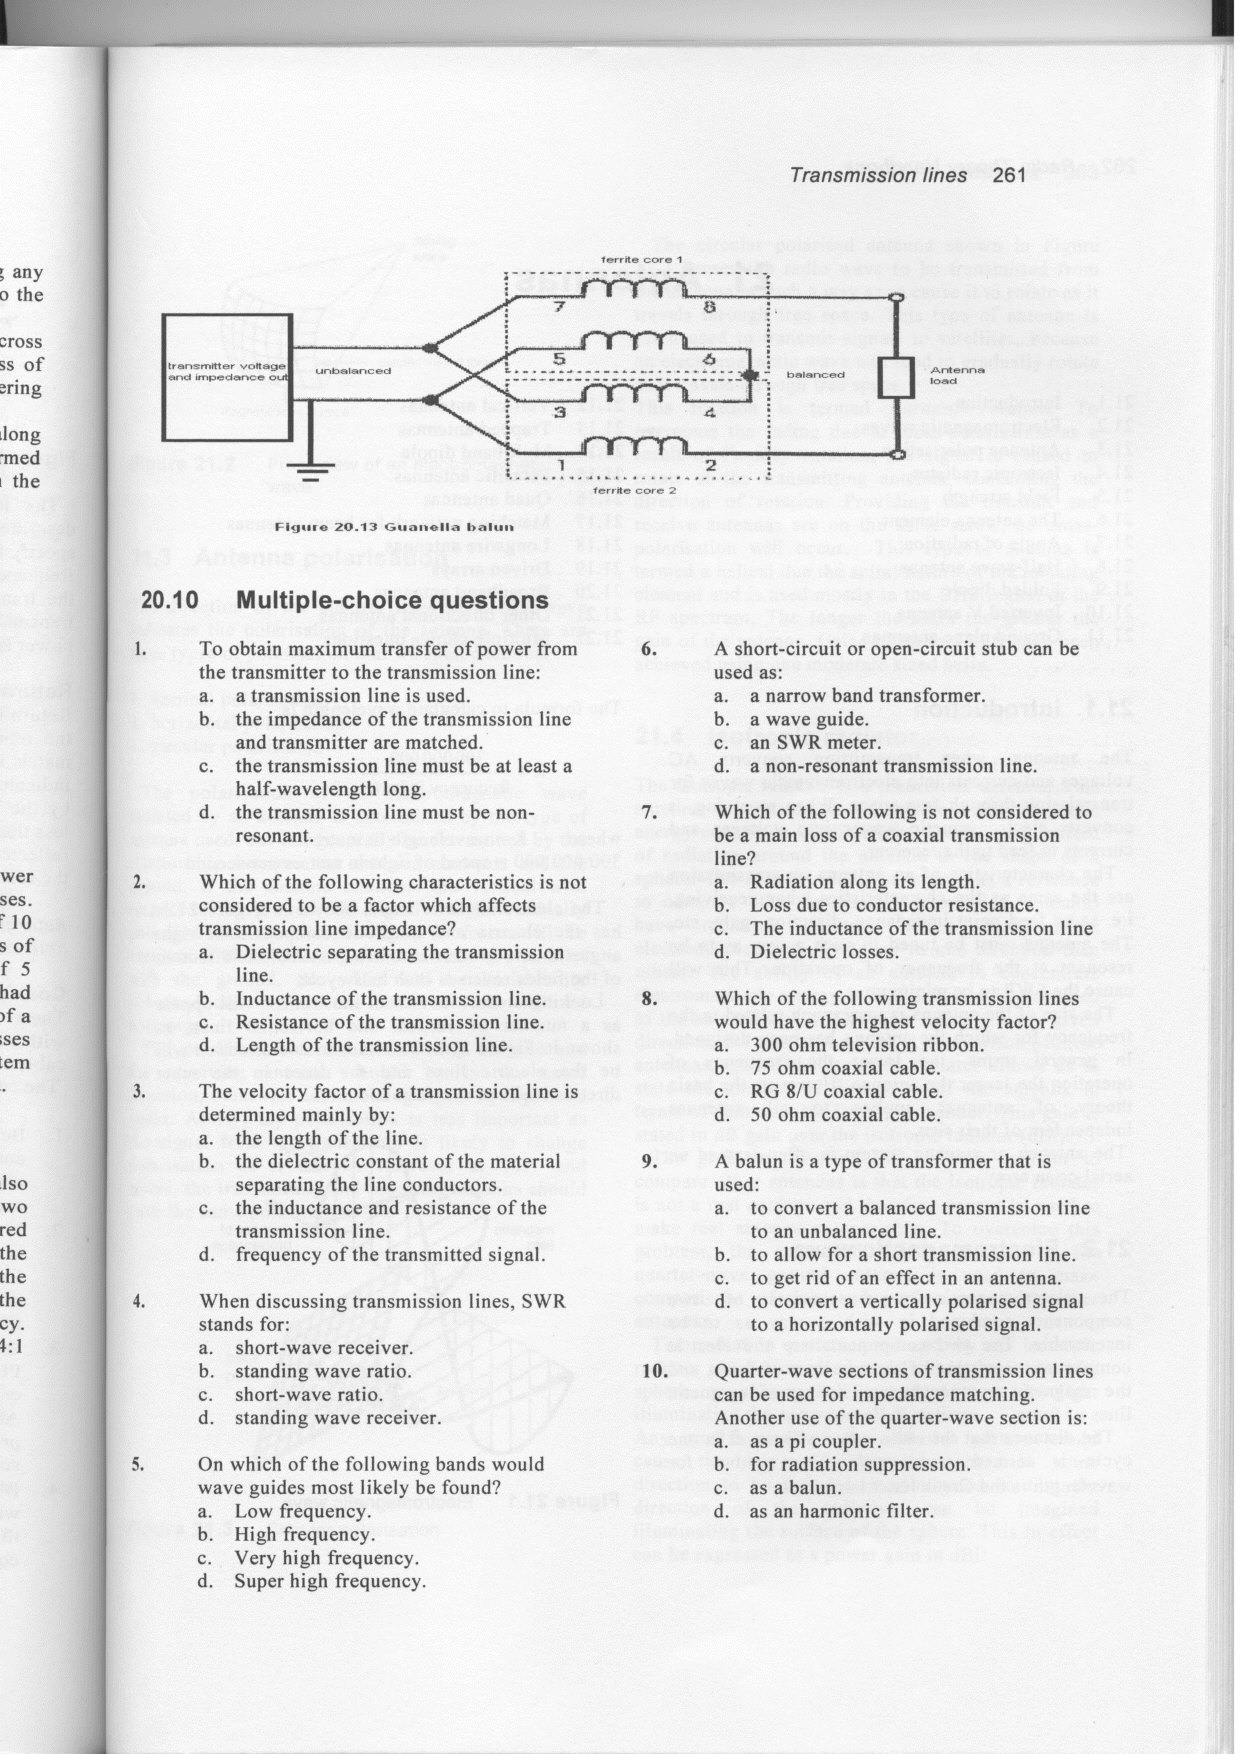 TransmissionLines